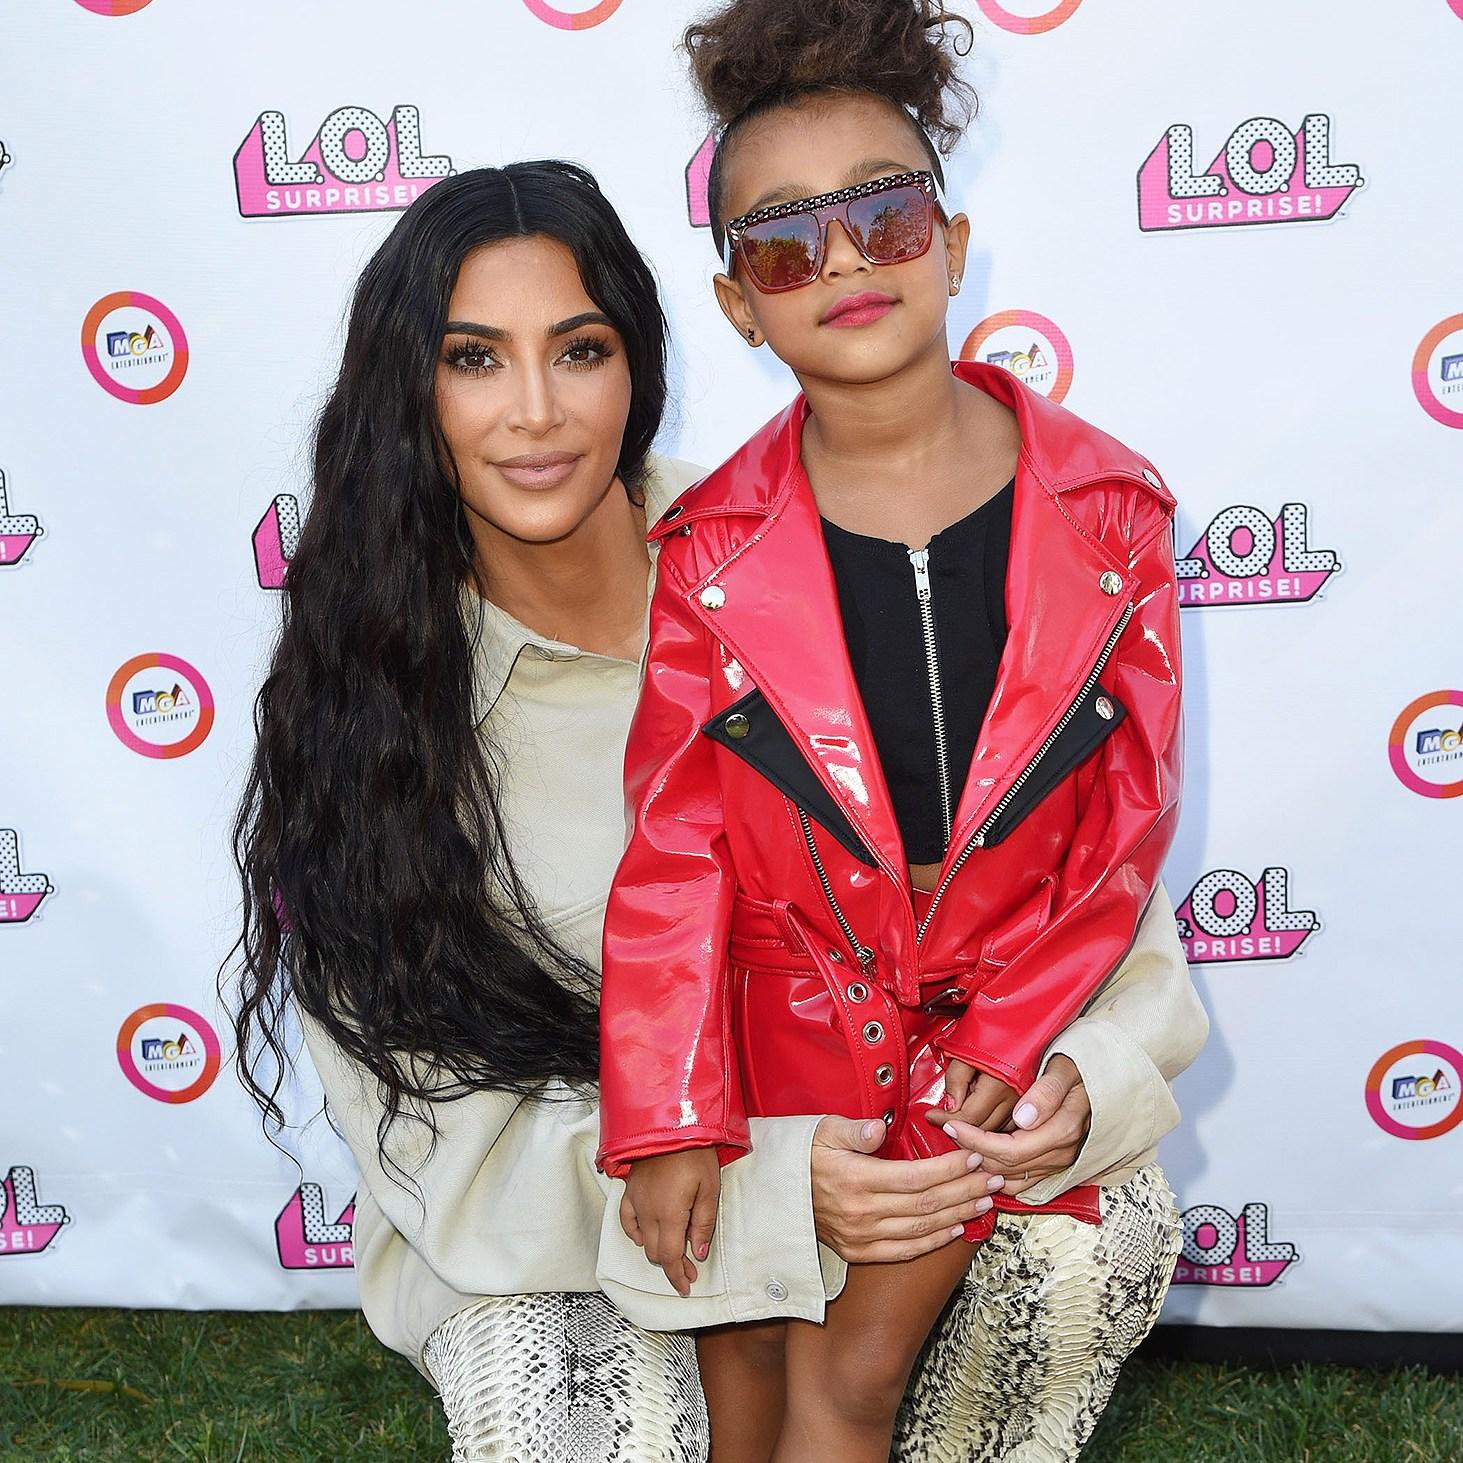 Kim Kardashian West, North West, Runway, LOL Surprise